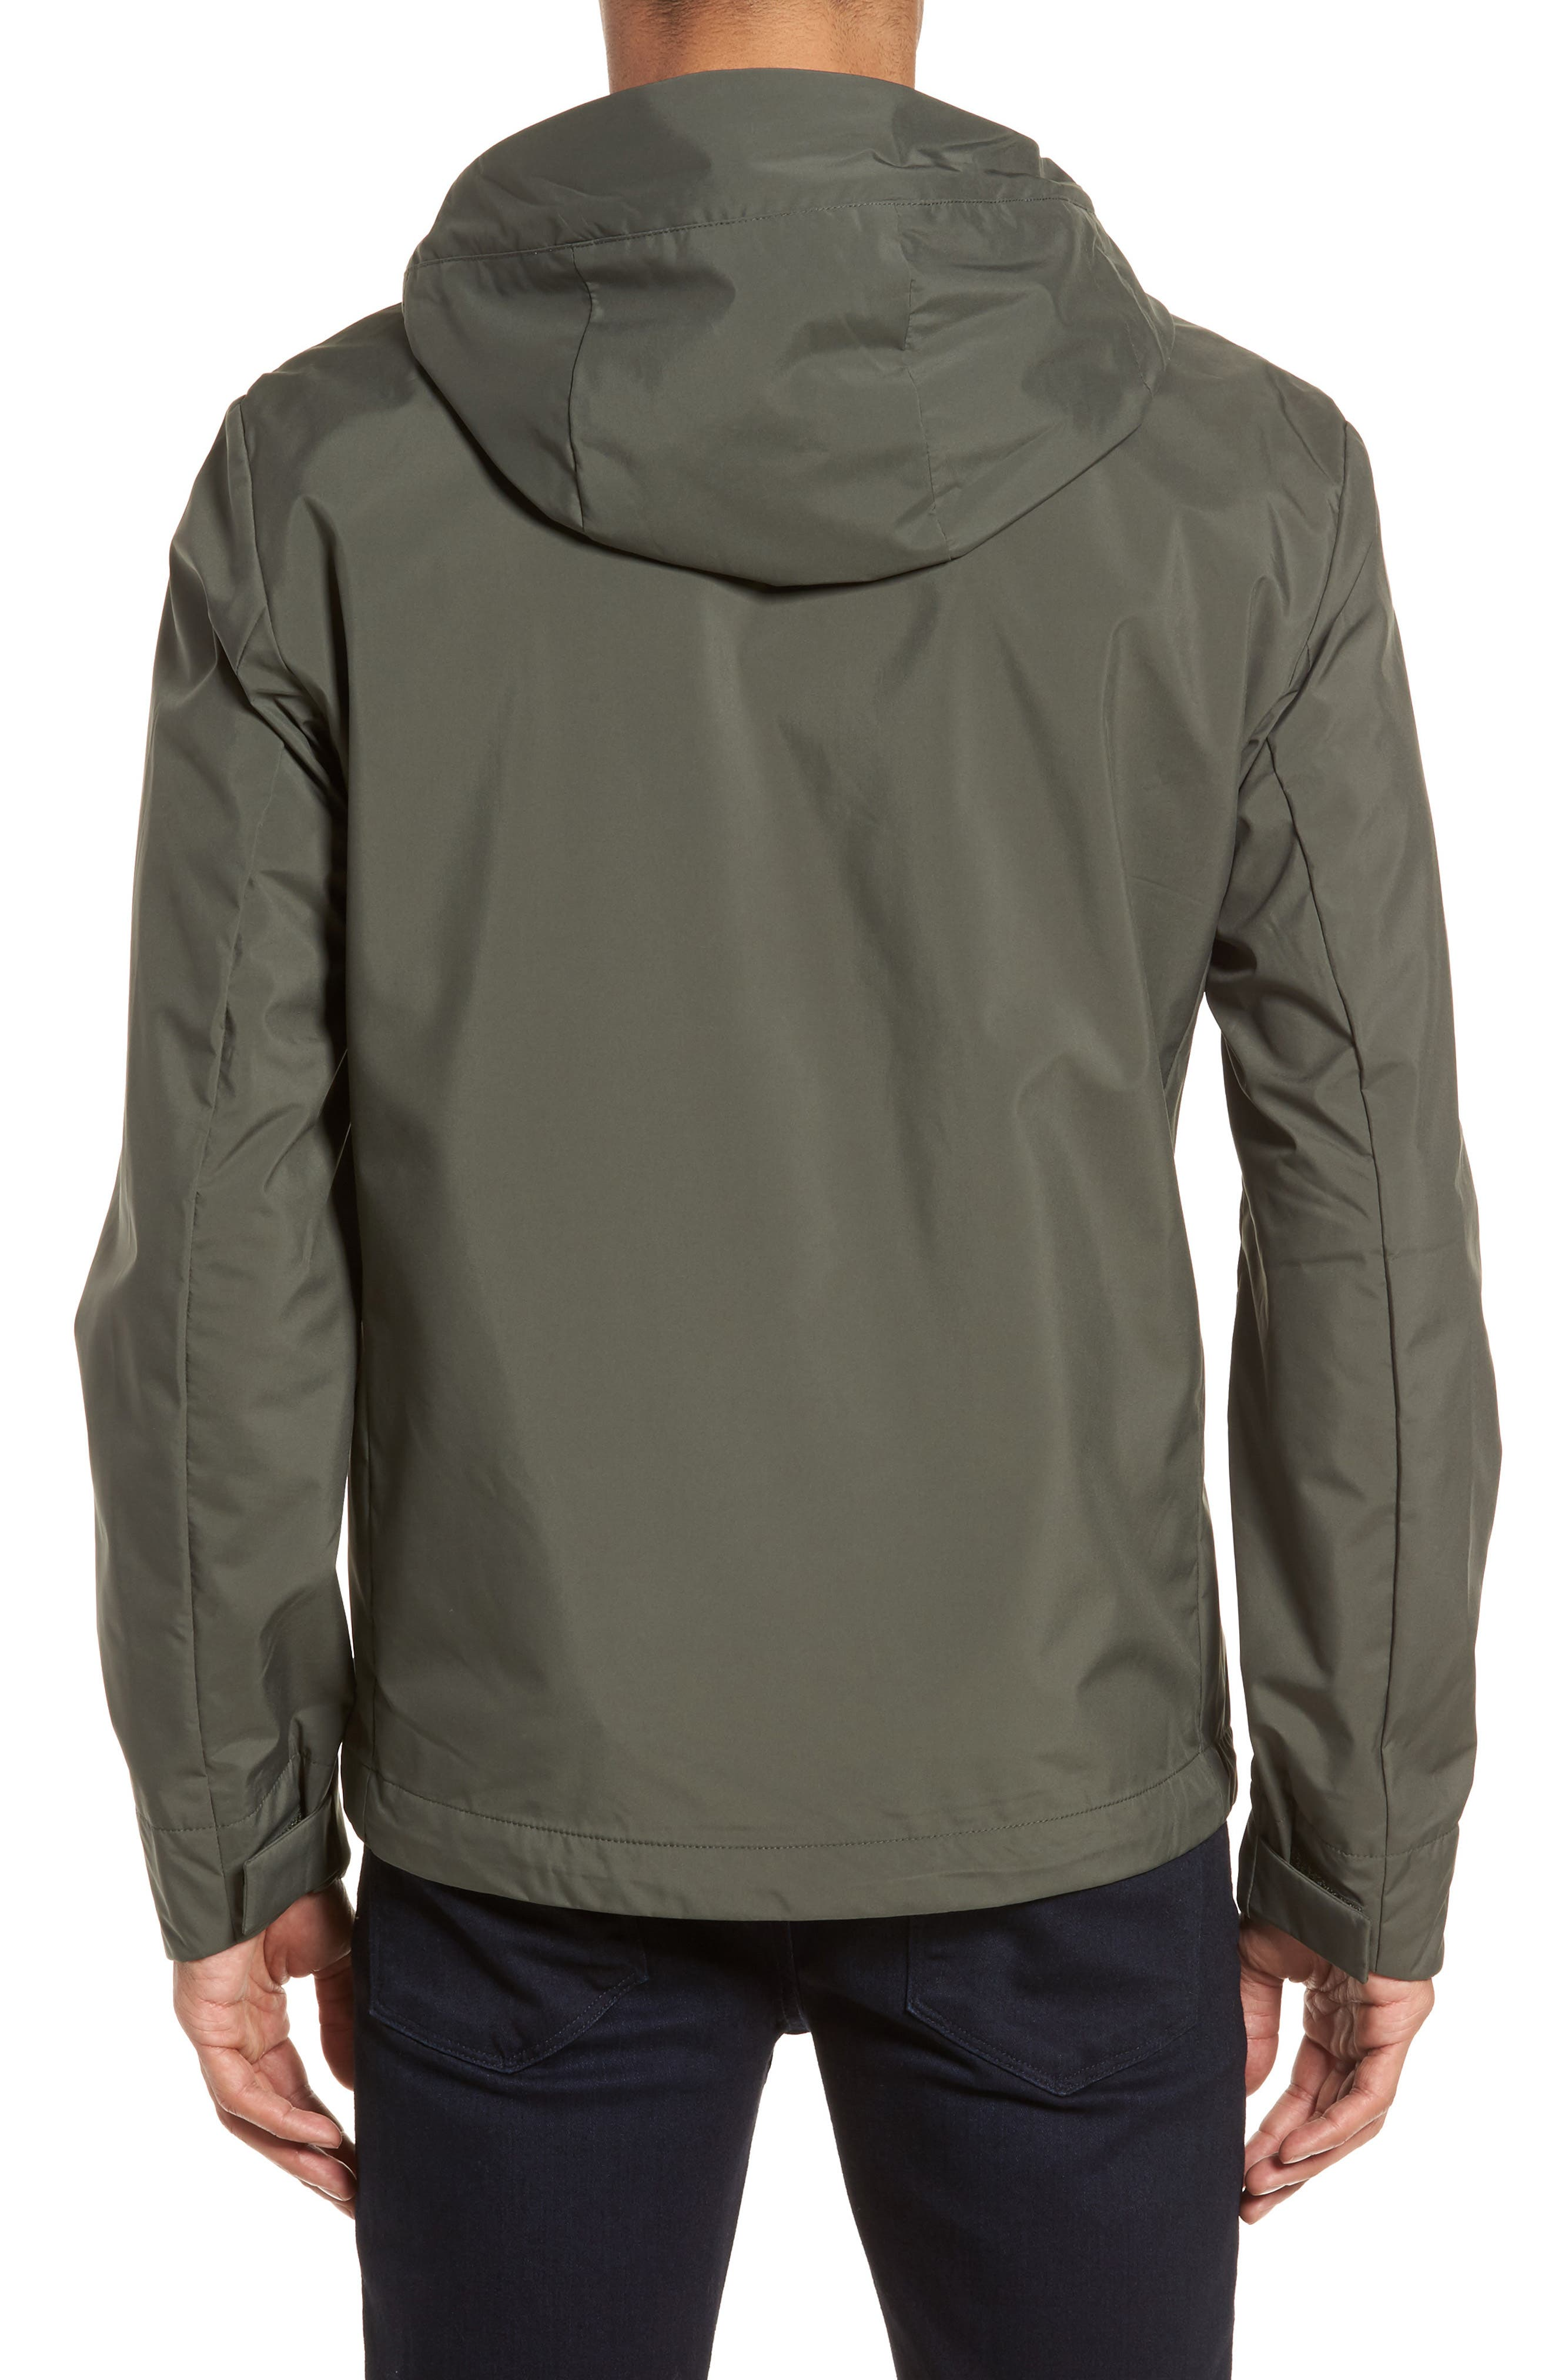 & Bros. Navigator Field Jacket,                             Alternate thumbnail 2, color,                             Grape Leaf